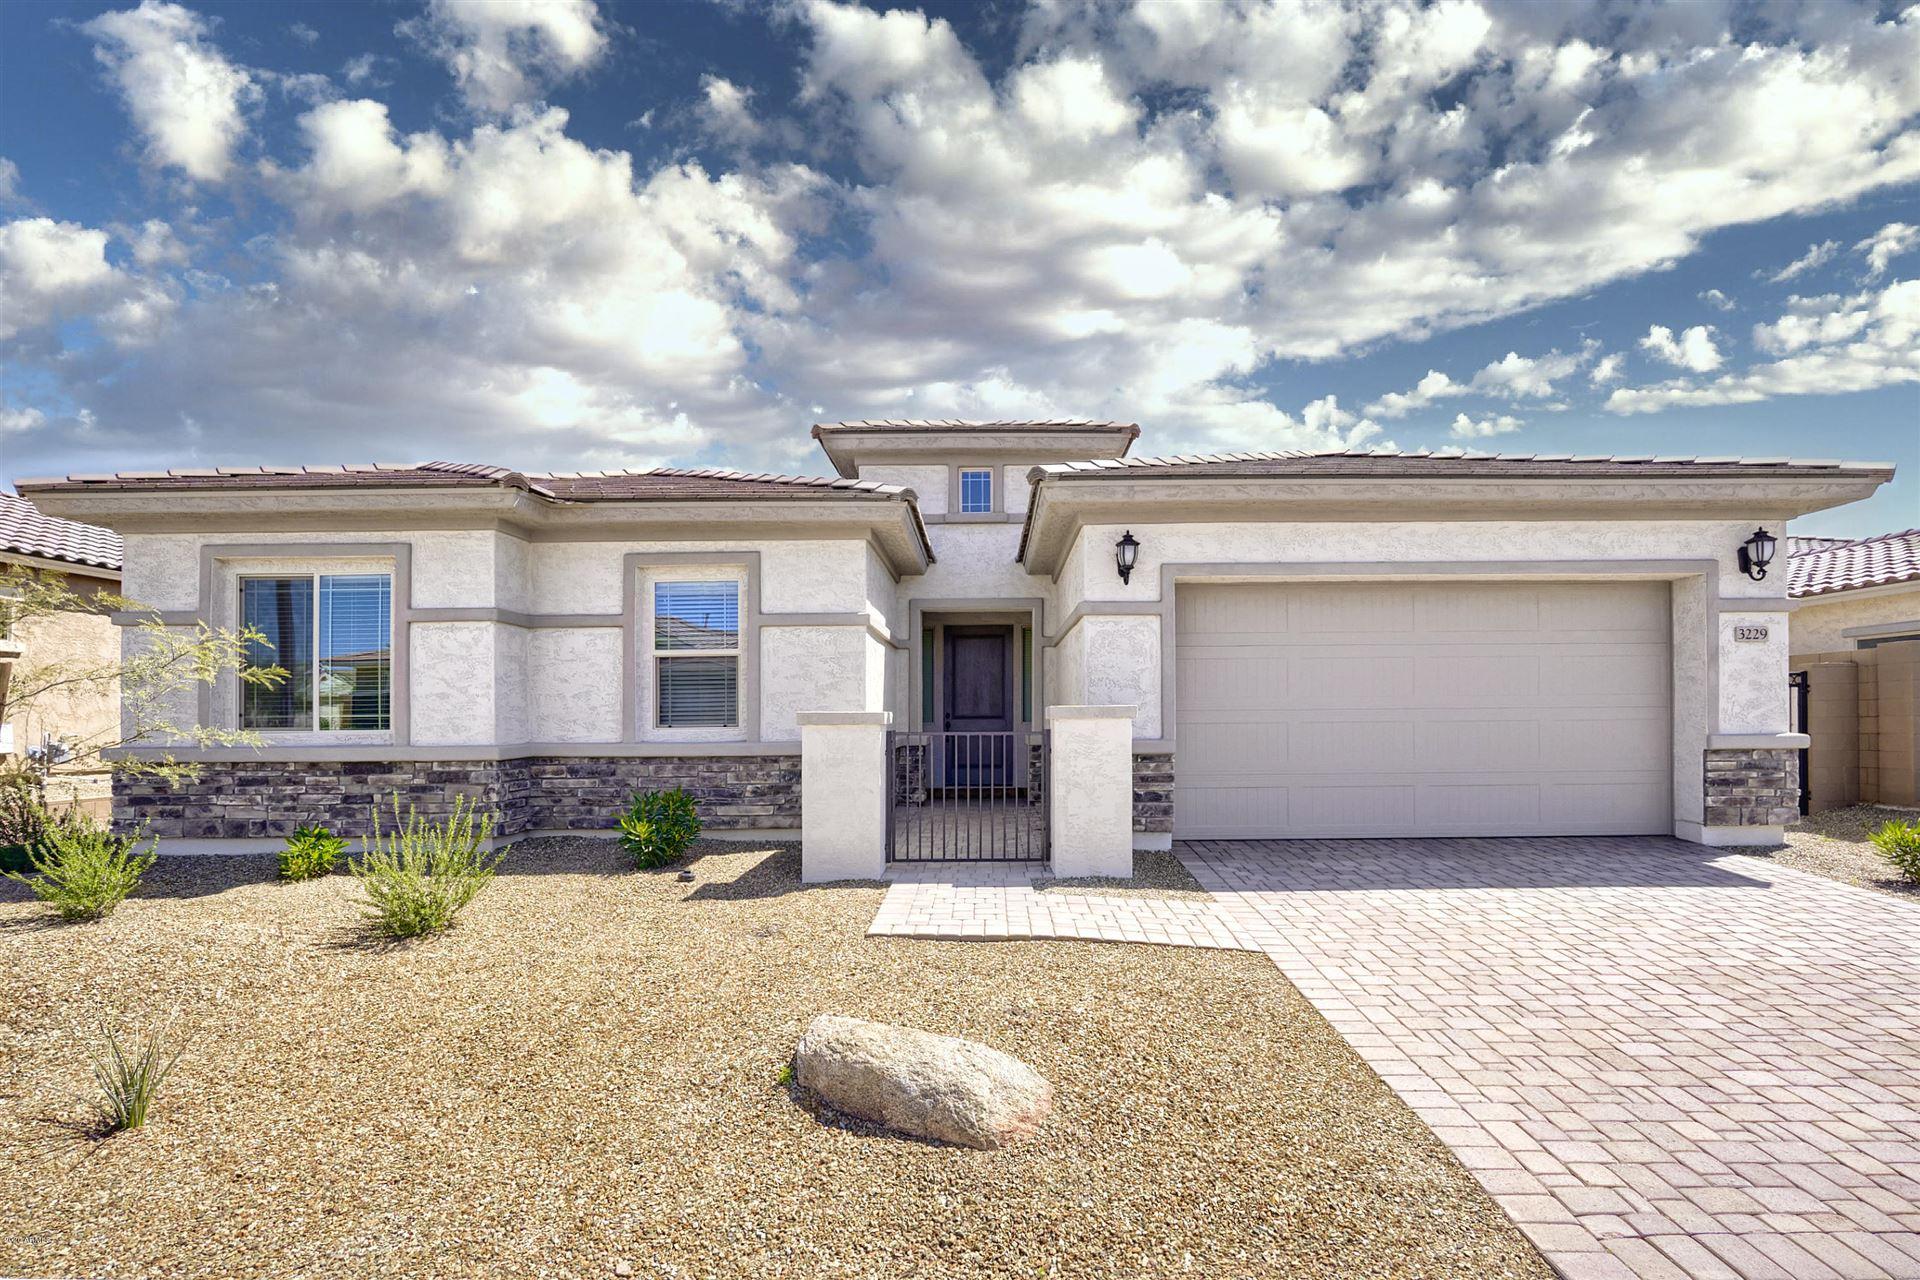 Property Image Of 3229 E Pike Street In Phoenix, Az